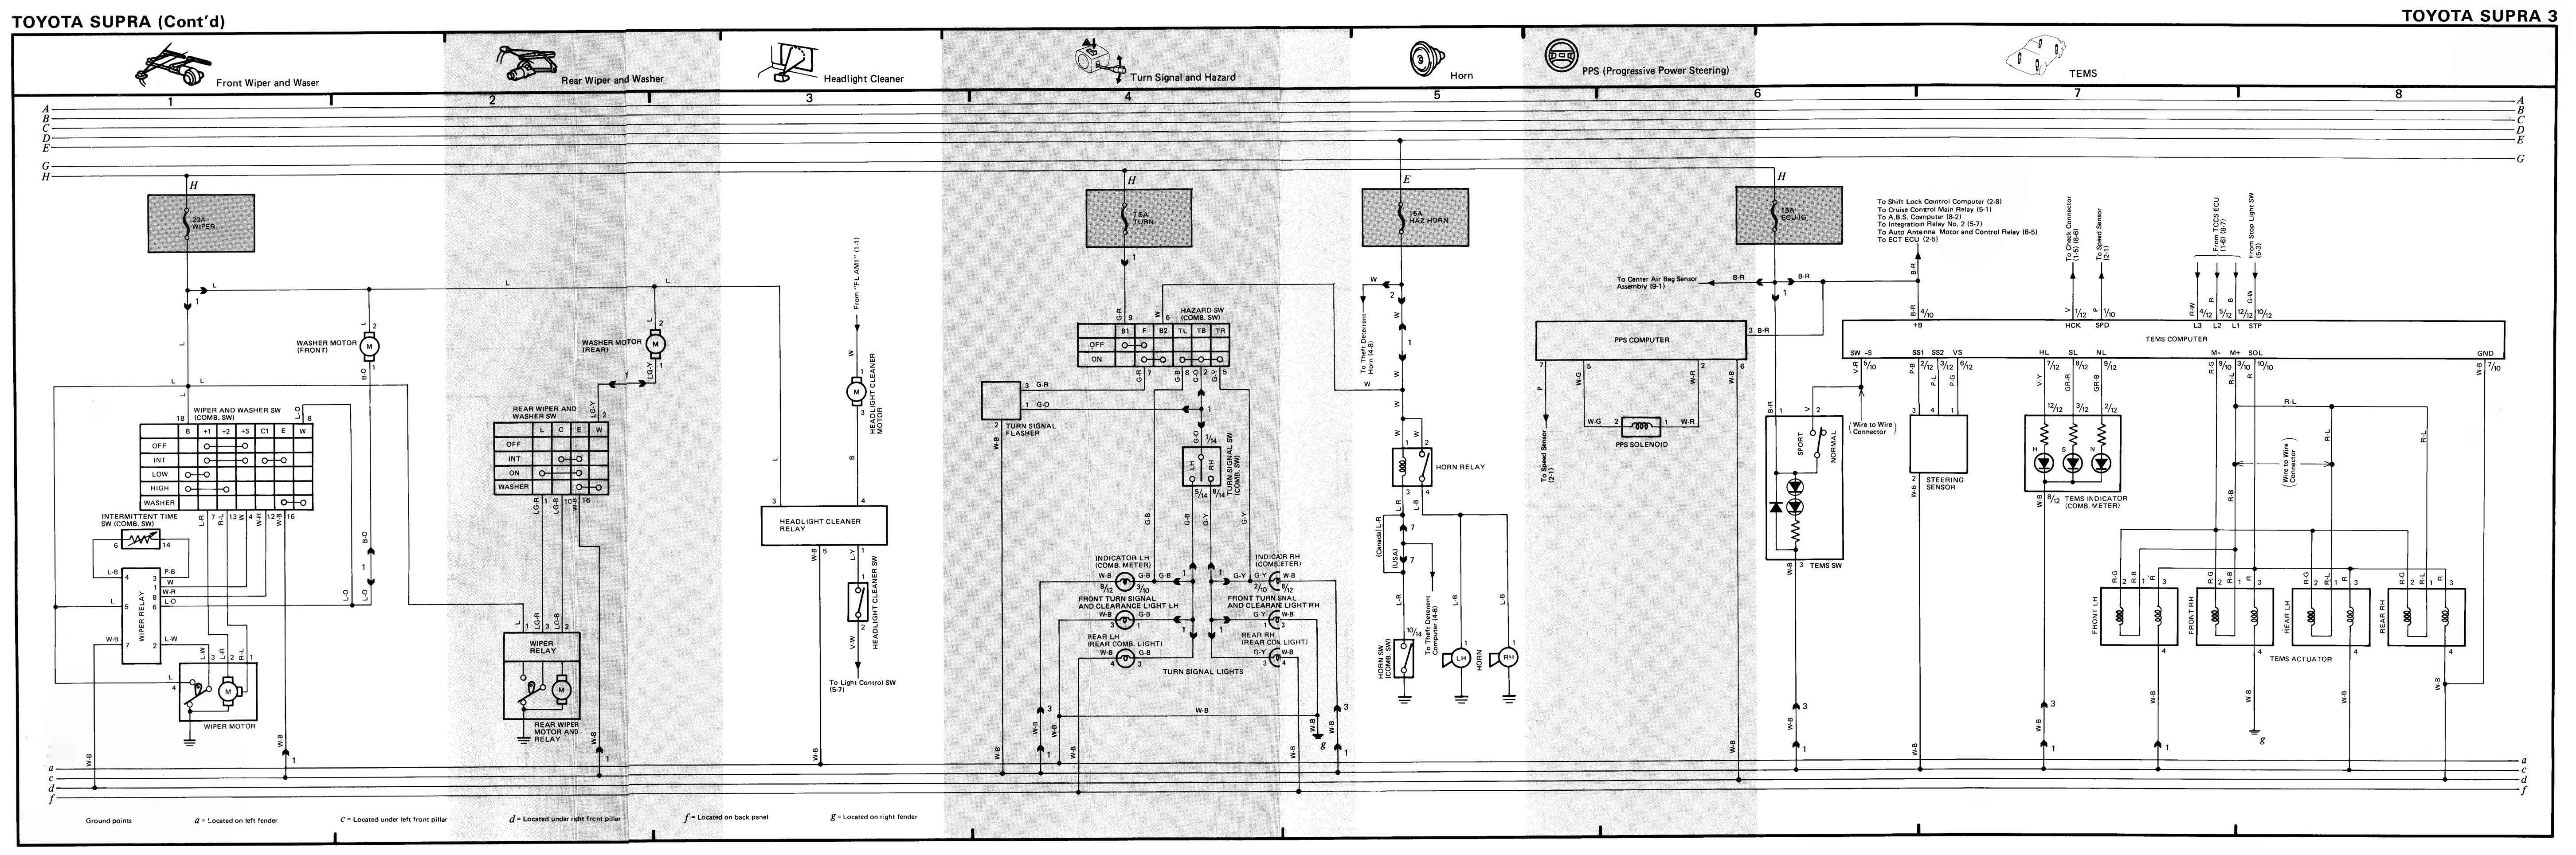 1jz vvti wiring diagram pdf corsa b mk3 supra tsrm toyota repair manual links downloads 88 87 clutch